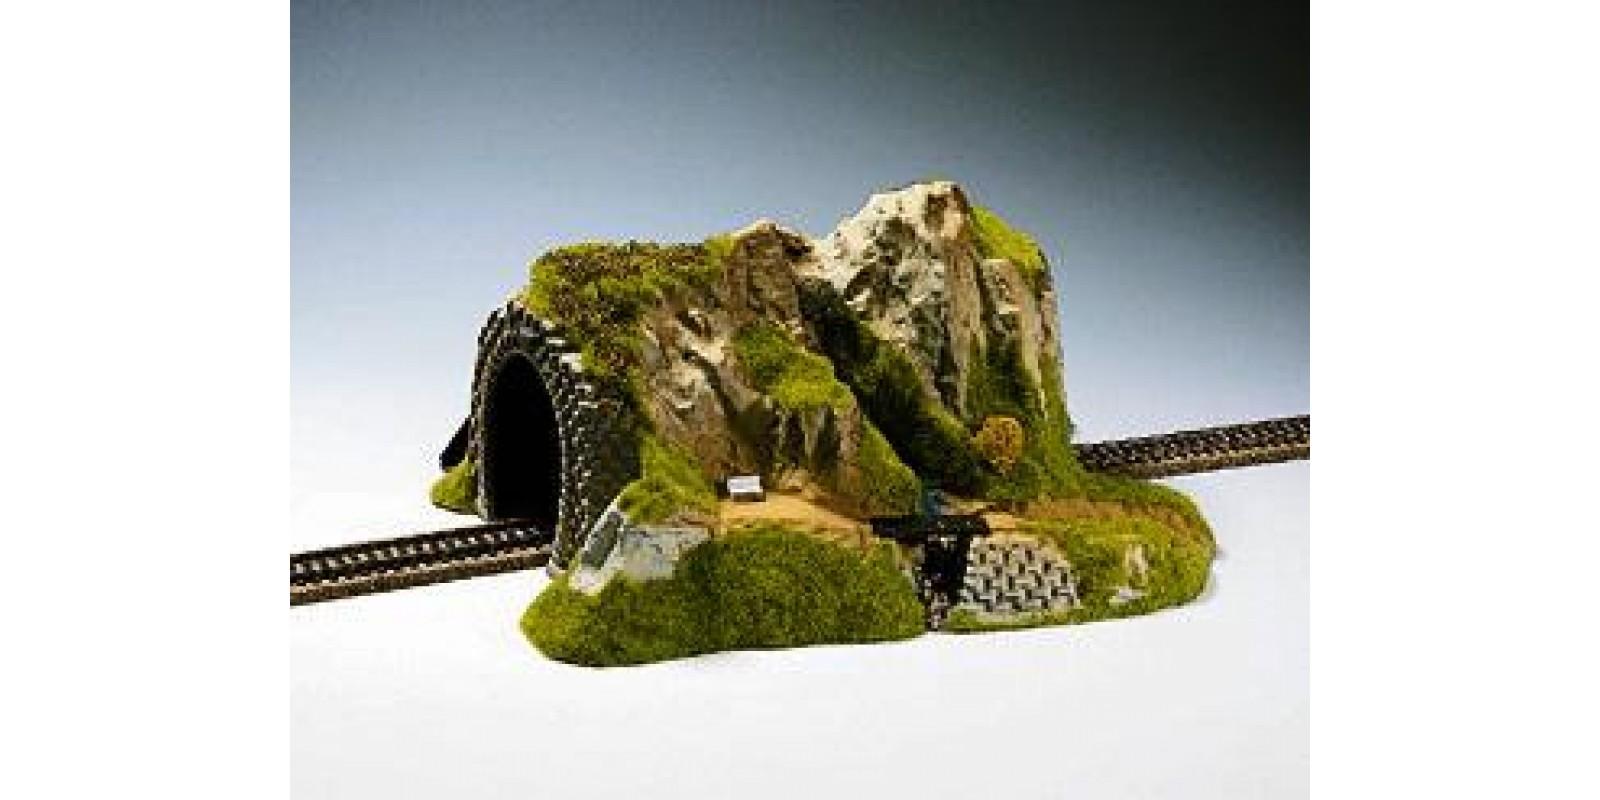 NO02200 Straight Tunnel, Single Track, 34 x 27 cm, 16 cm Height